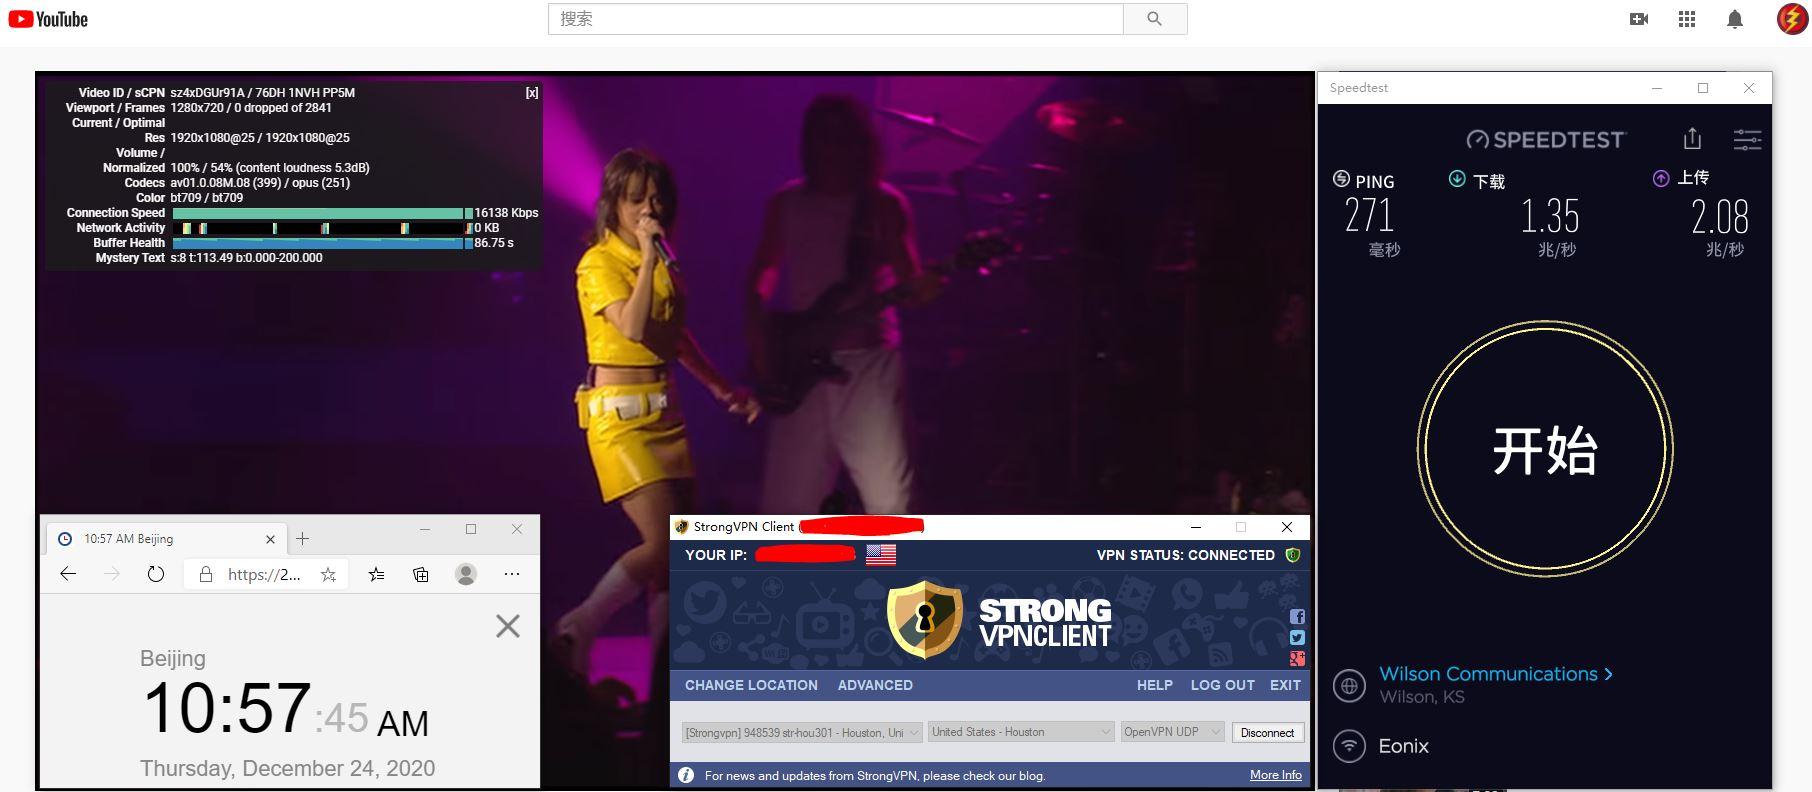 Windows10 StrongVPN USA - Houston 服务器 中国VPN 翻墙 科学上网 测试 - 20201224